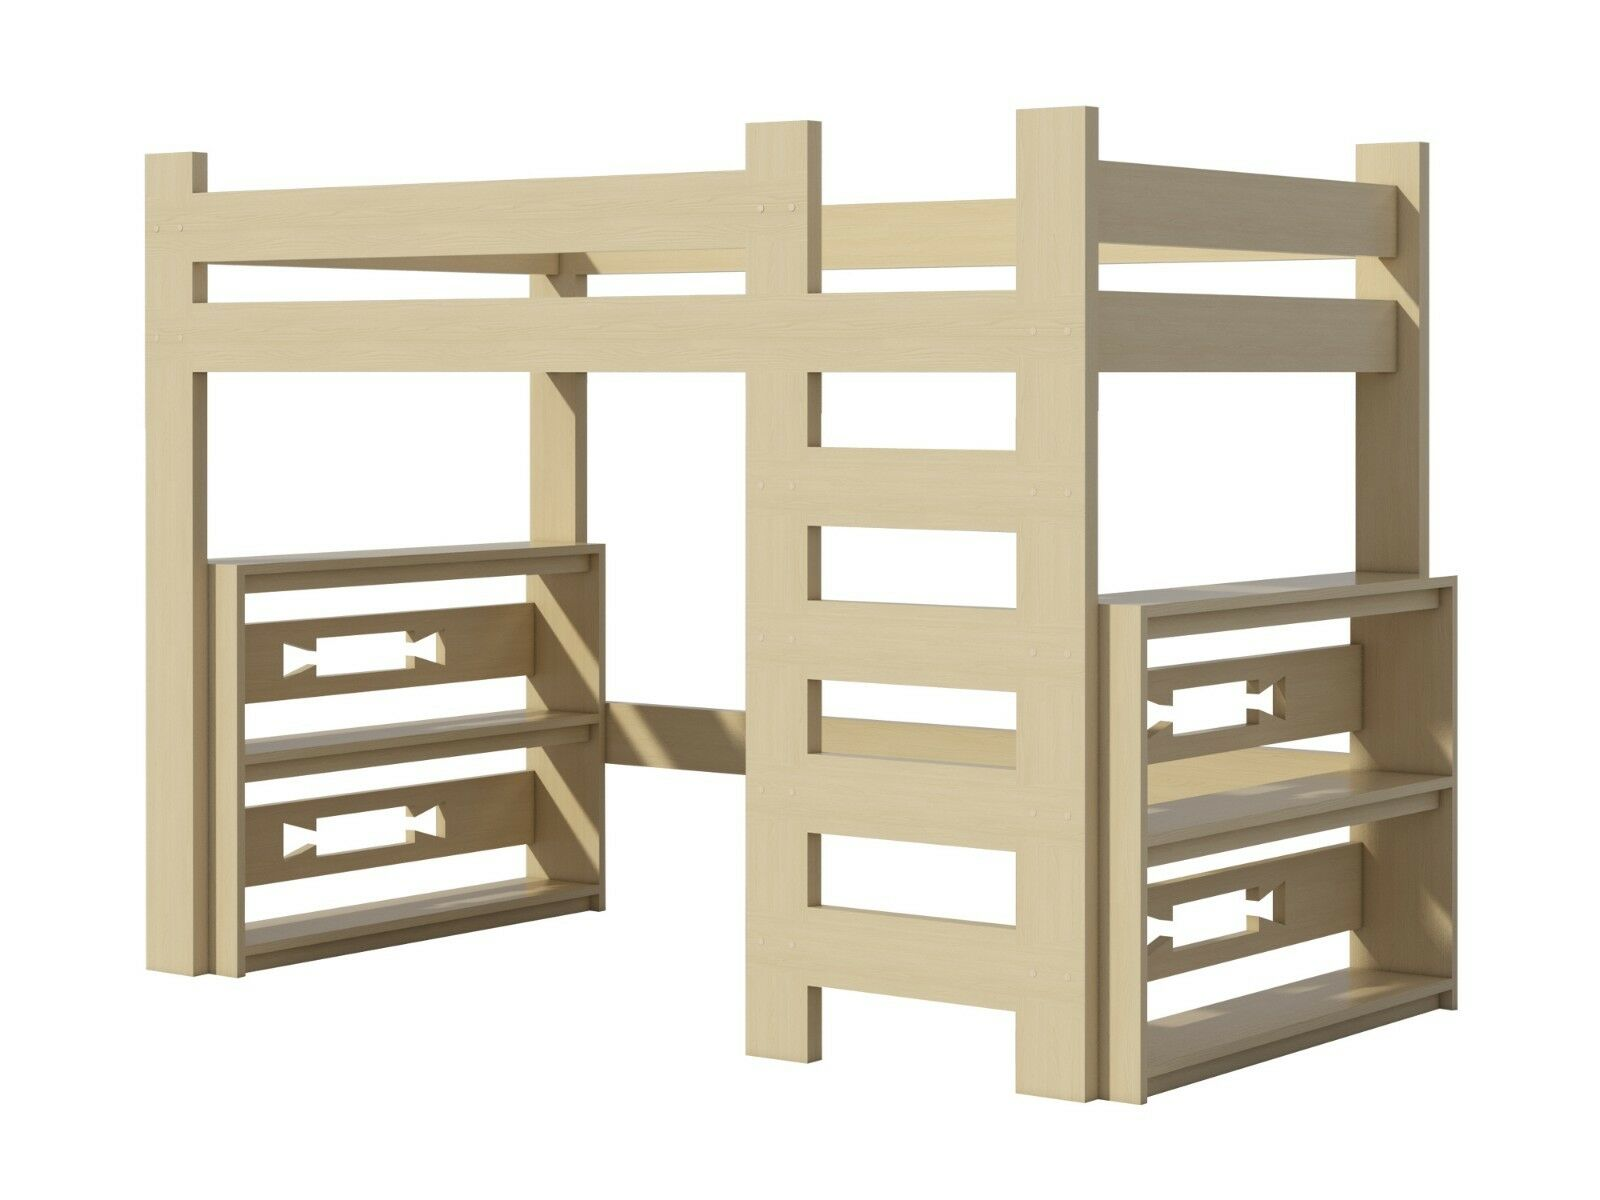 Loft Bed Plans DIY For Kids College Dorm Woodworking Furniture Build Your  Own